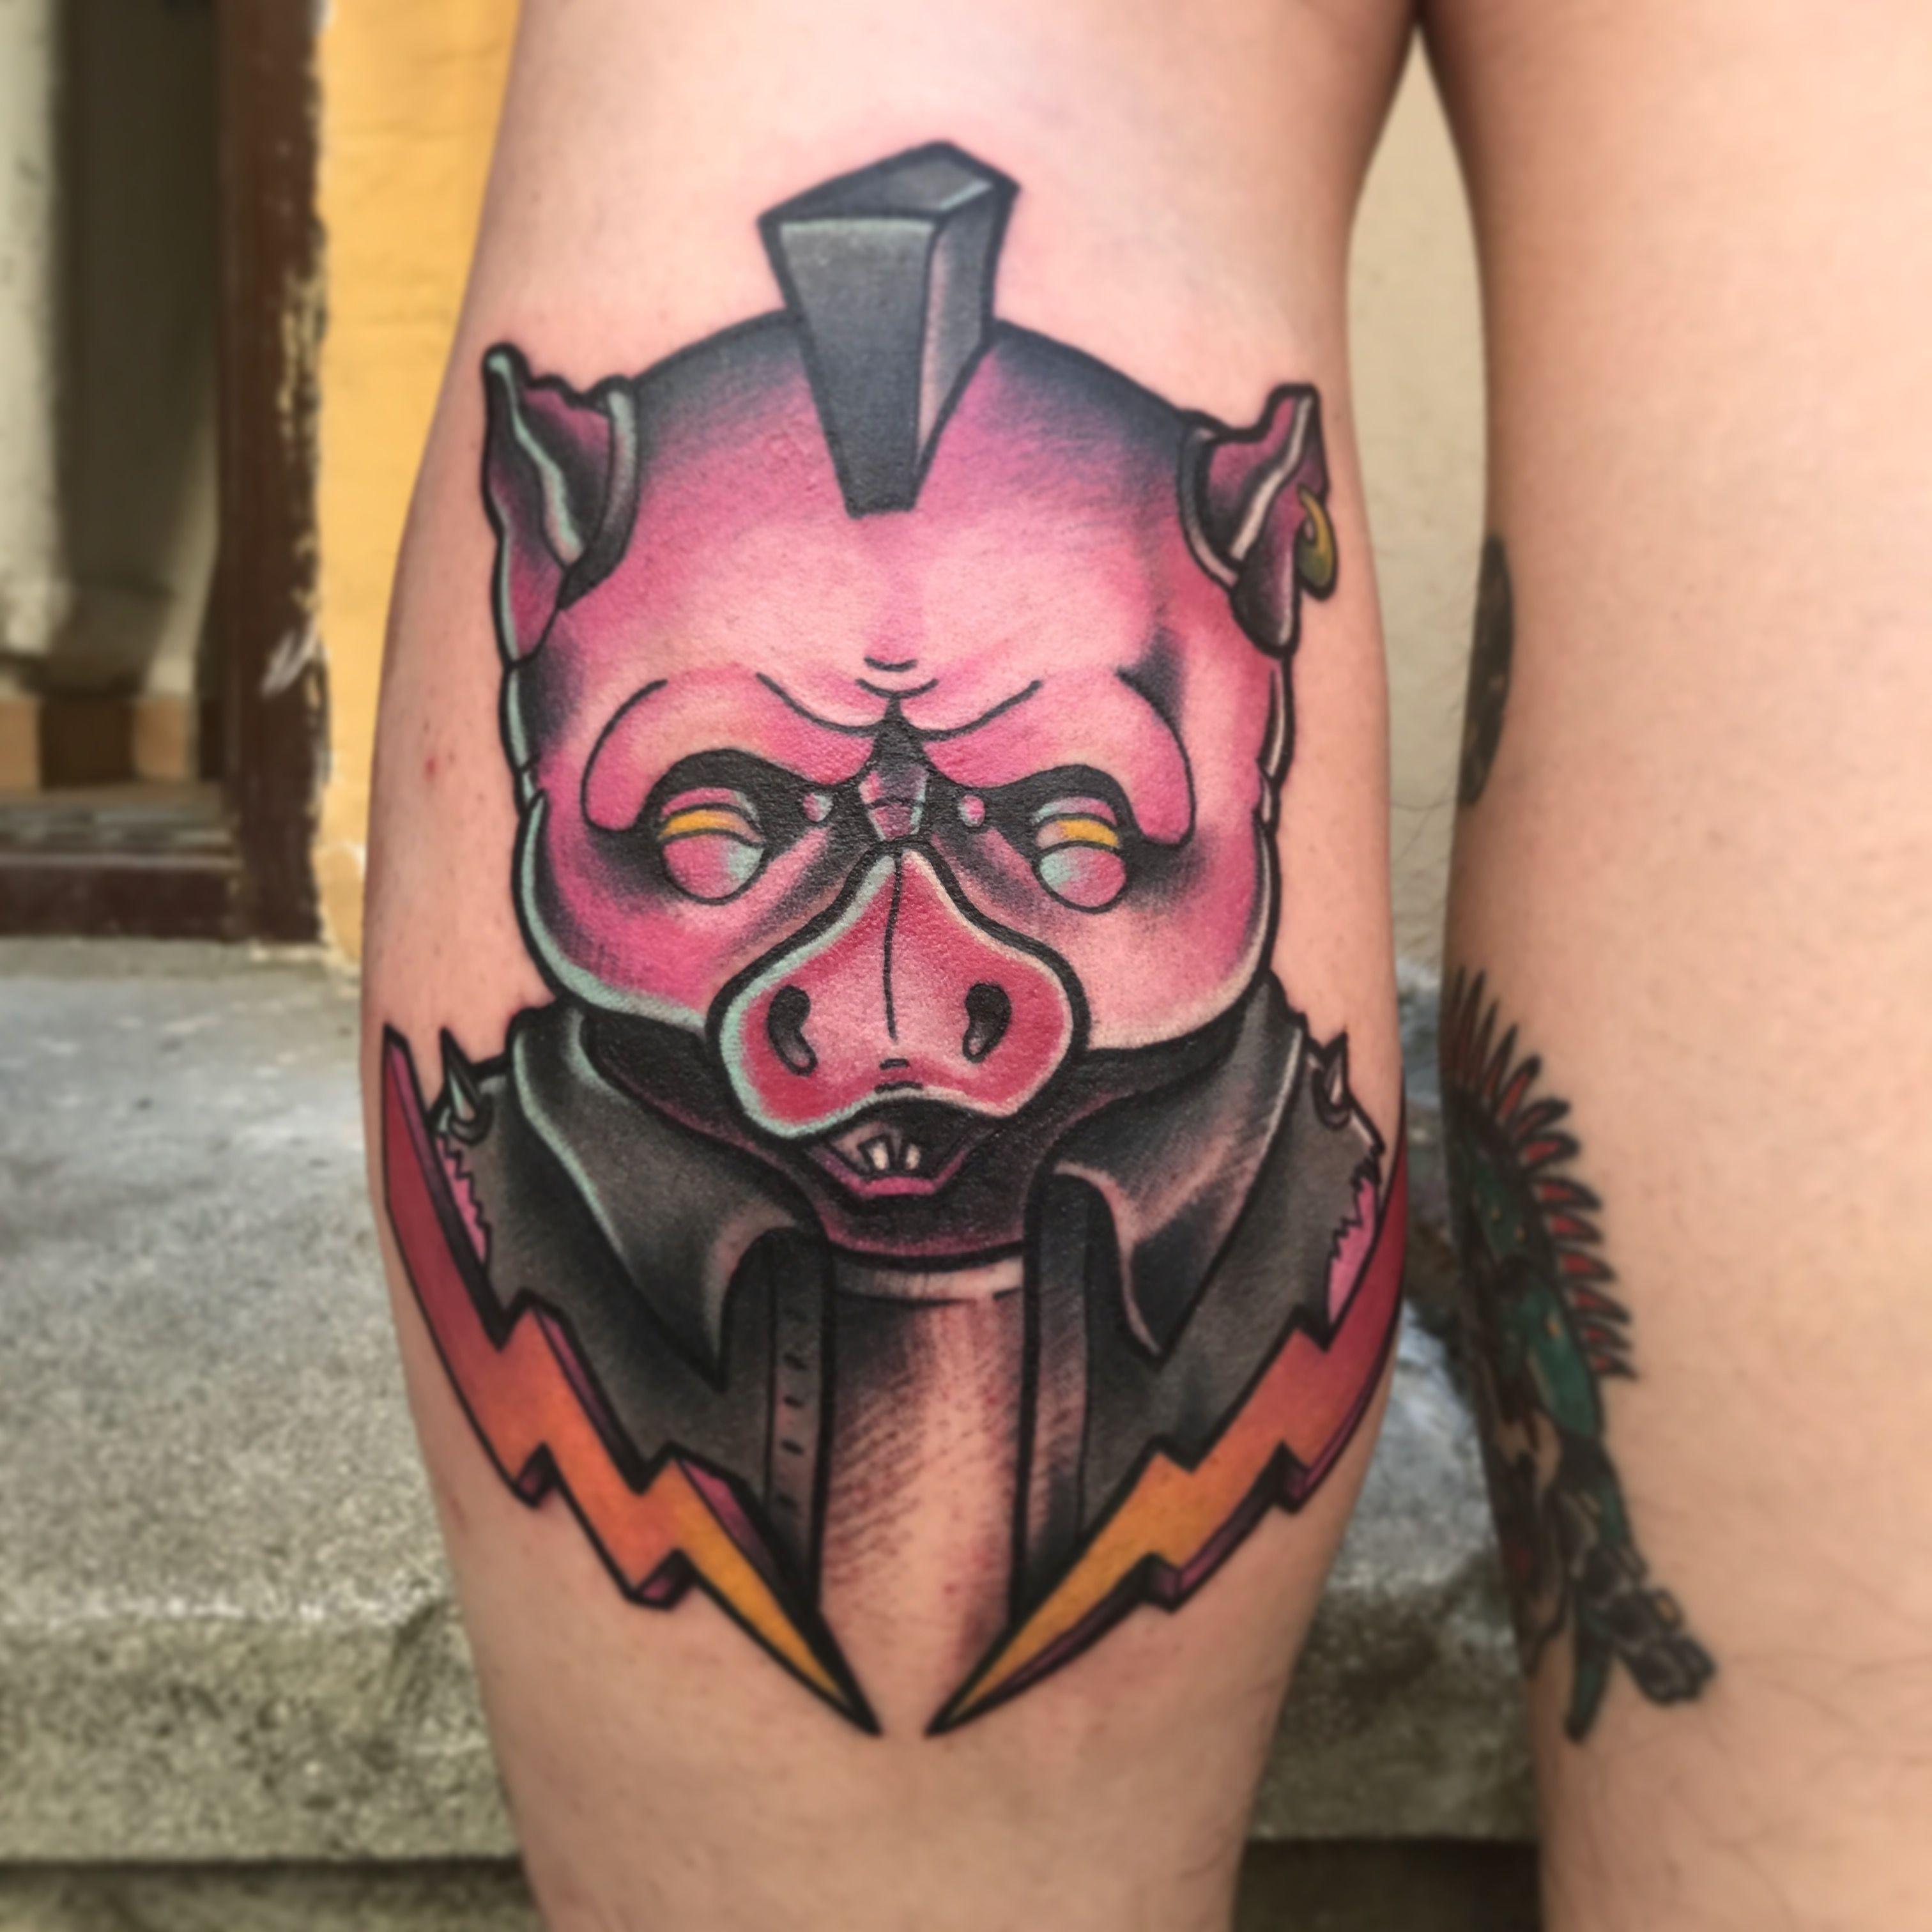 New school pig By Fifth Dimension Tattoo & Piercing